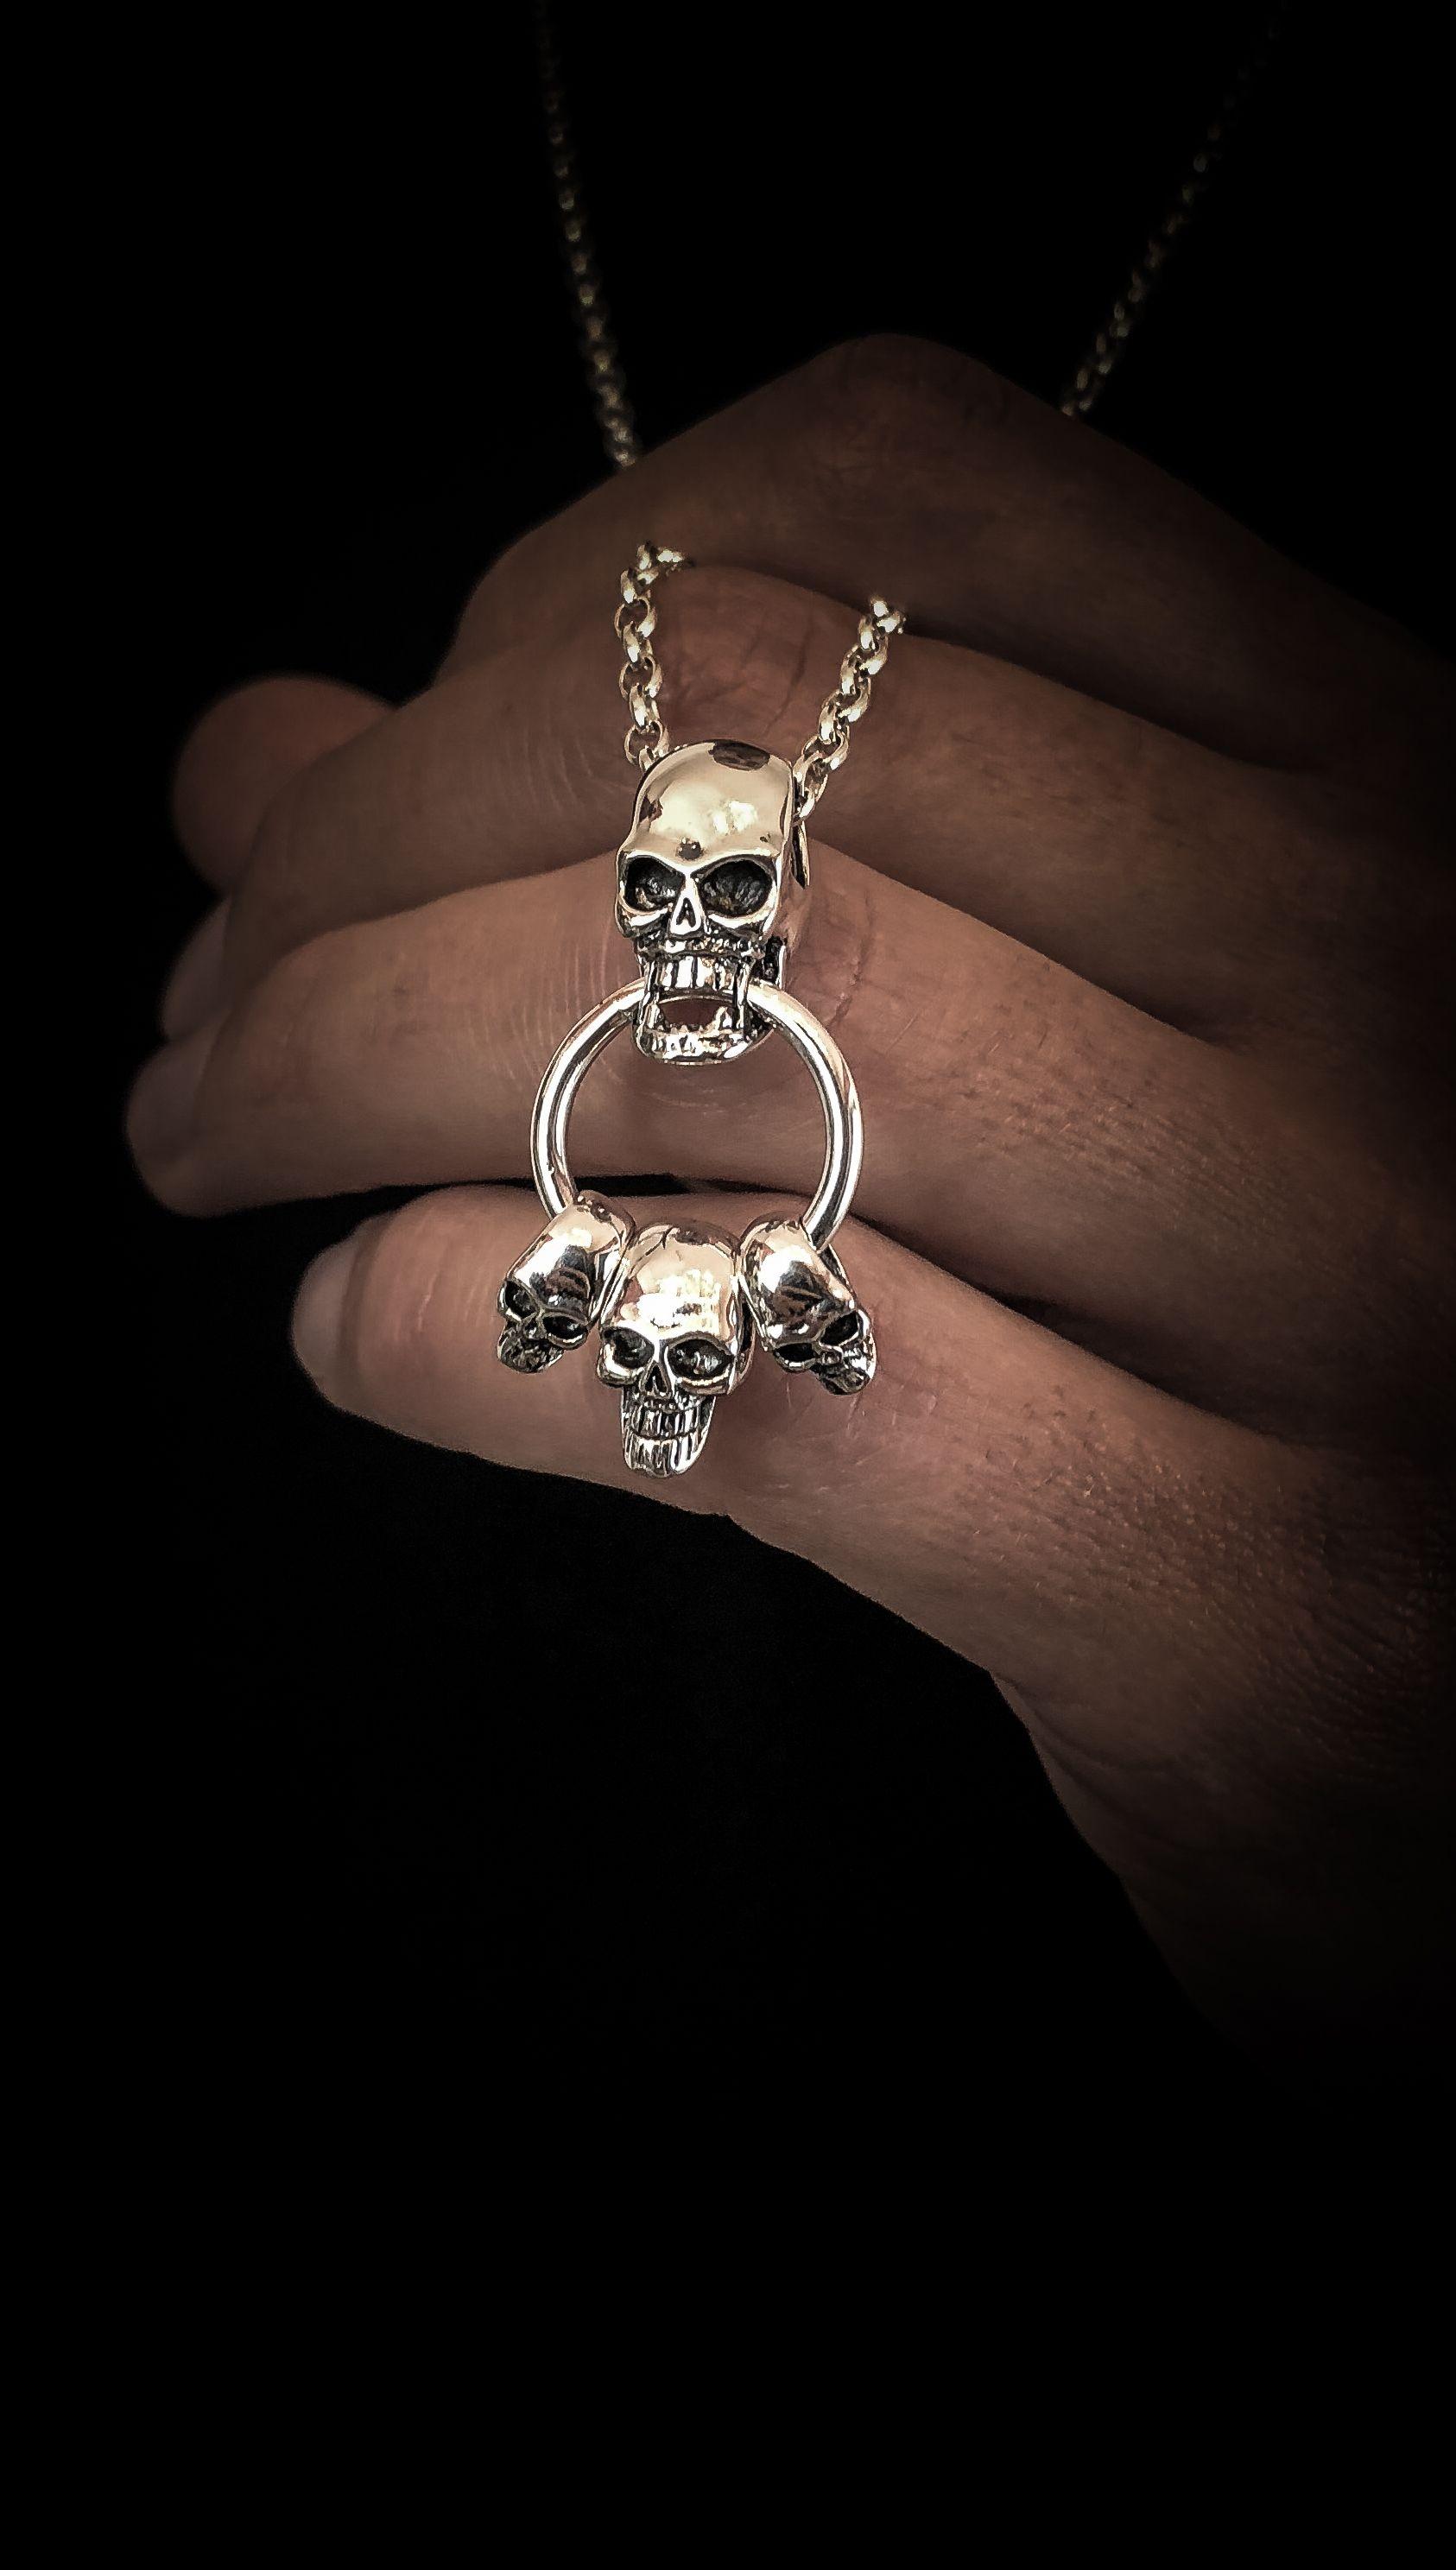 Mens skull door knocker necklace sterling silver pendant and